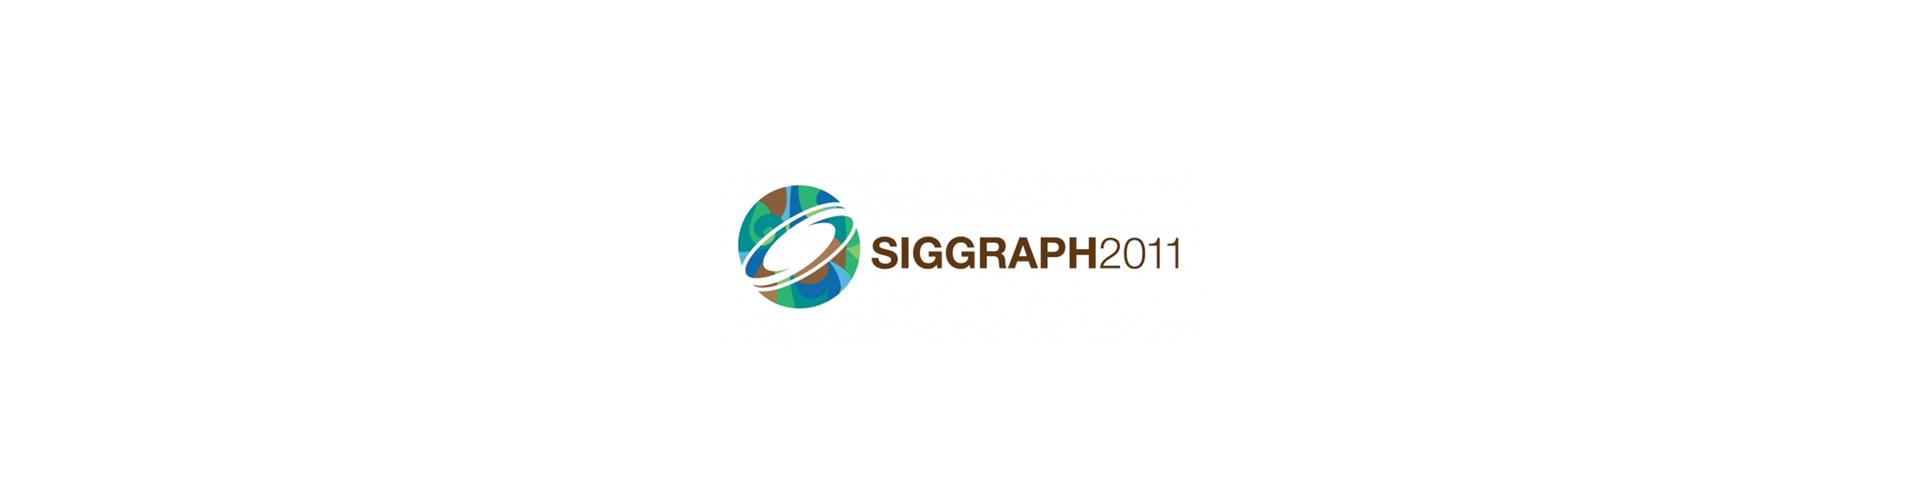 SIGGRAPH 2011 Logo